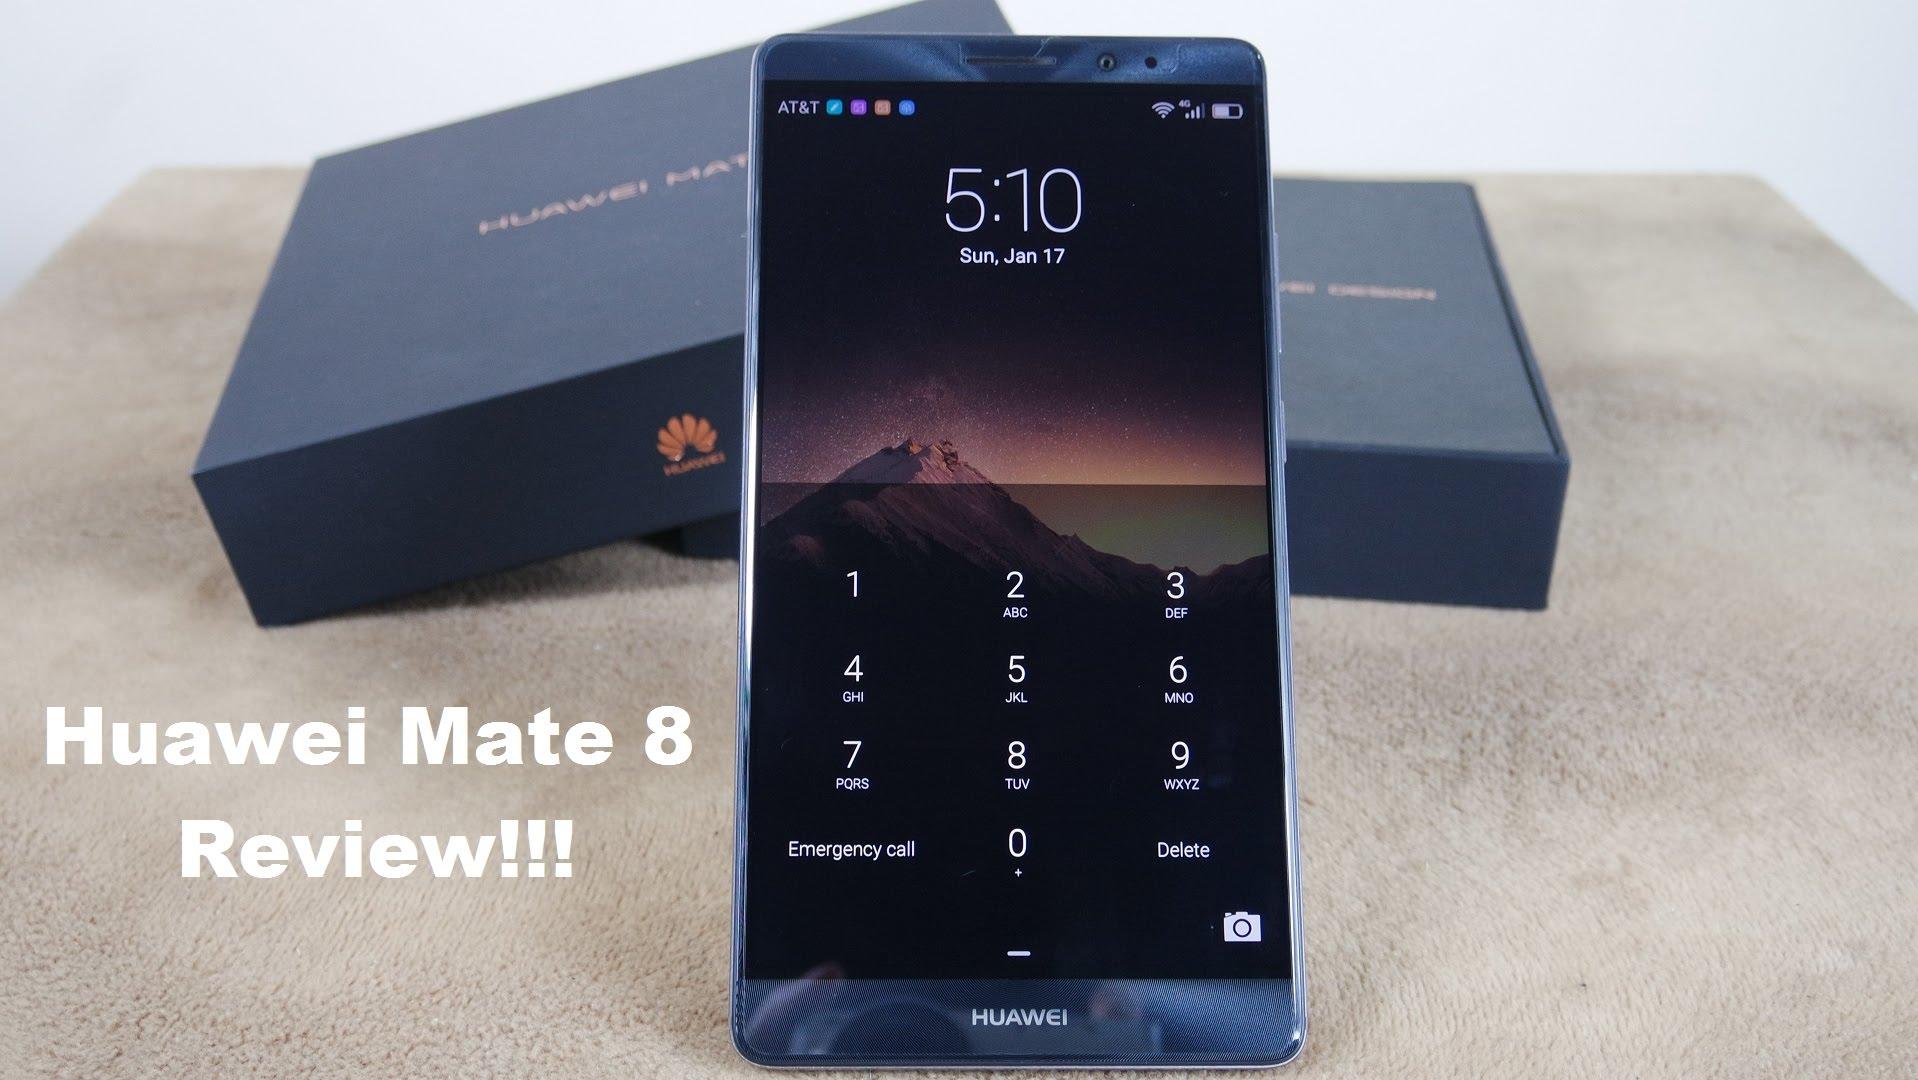 5 Reasons to buy the Huawei Mate 8